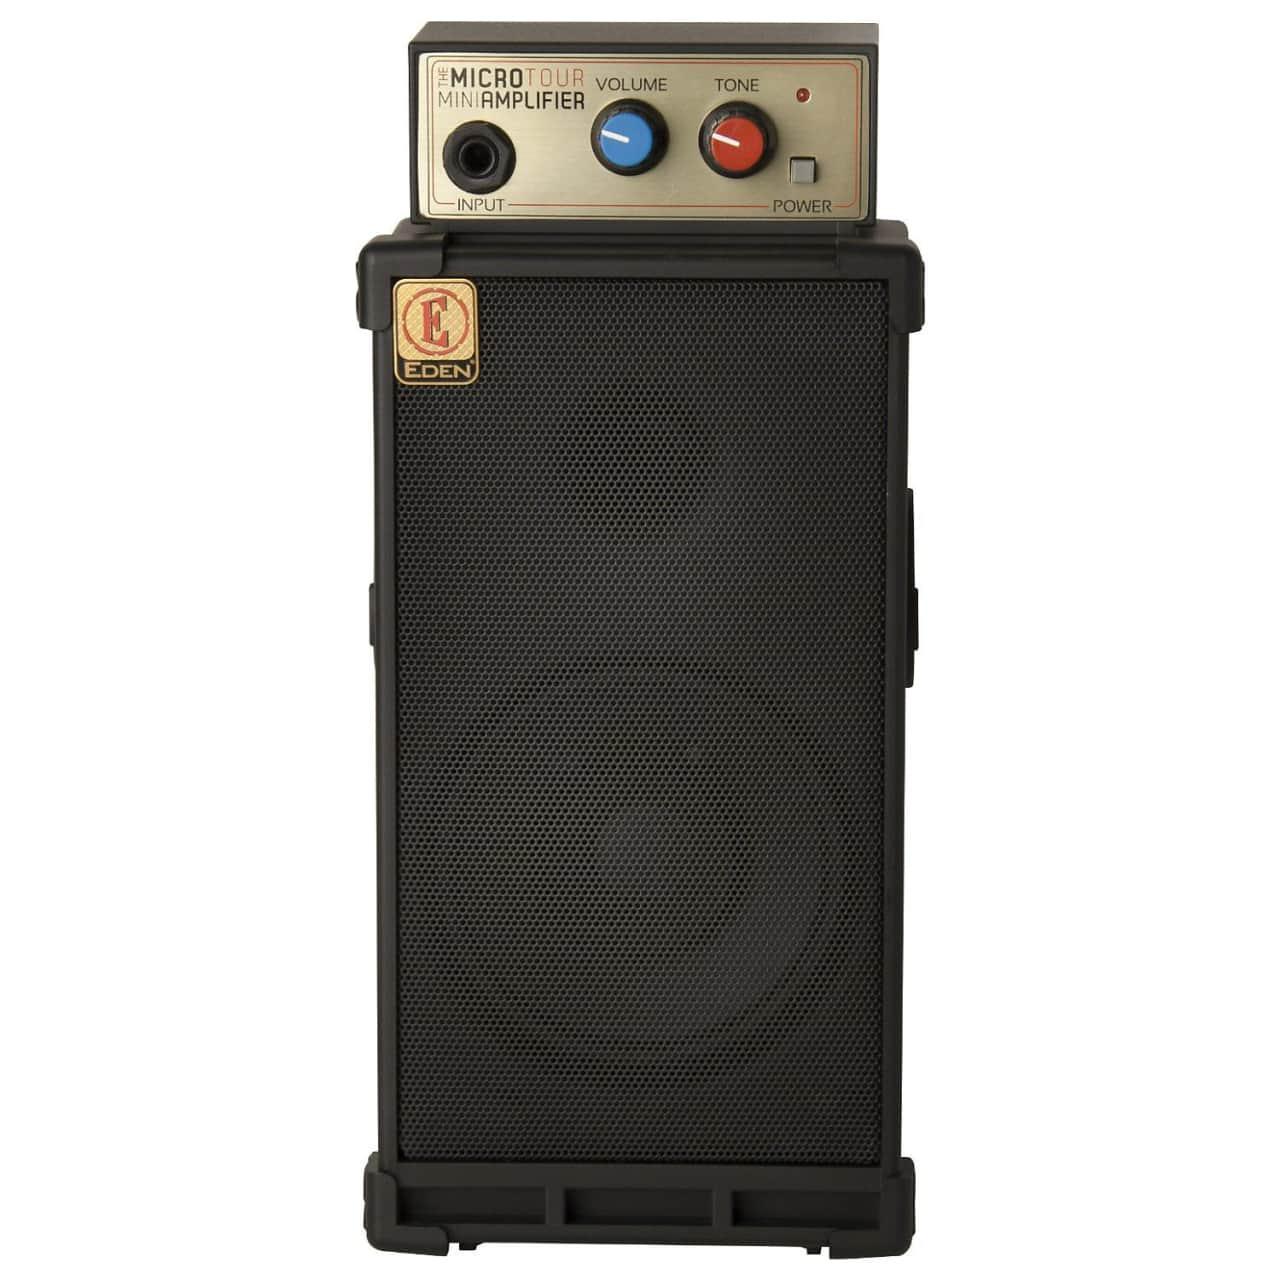 eden usm microtour u portable micro bass amplifier reverb. Black Bedroom Furniture Sets. Home Design Ideas